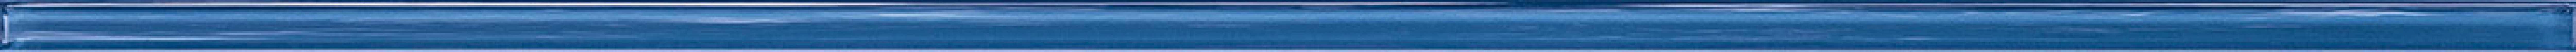 Бордюр Tubadzin Dots Blue 74.8x1.5